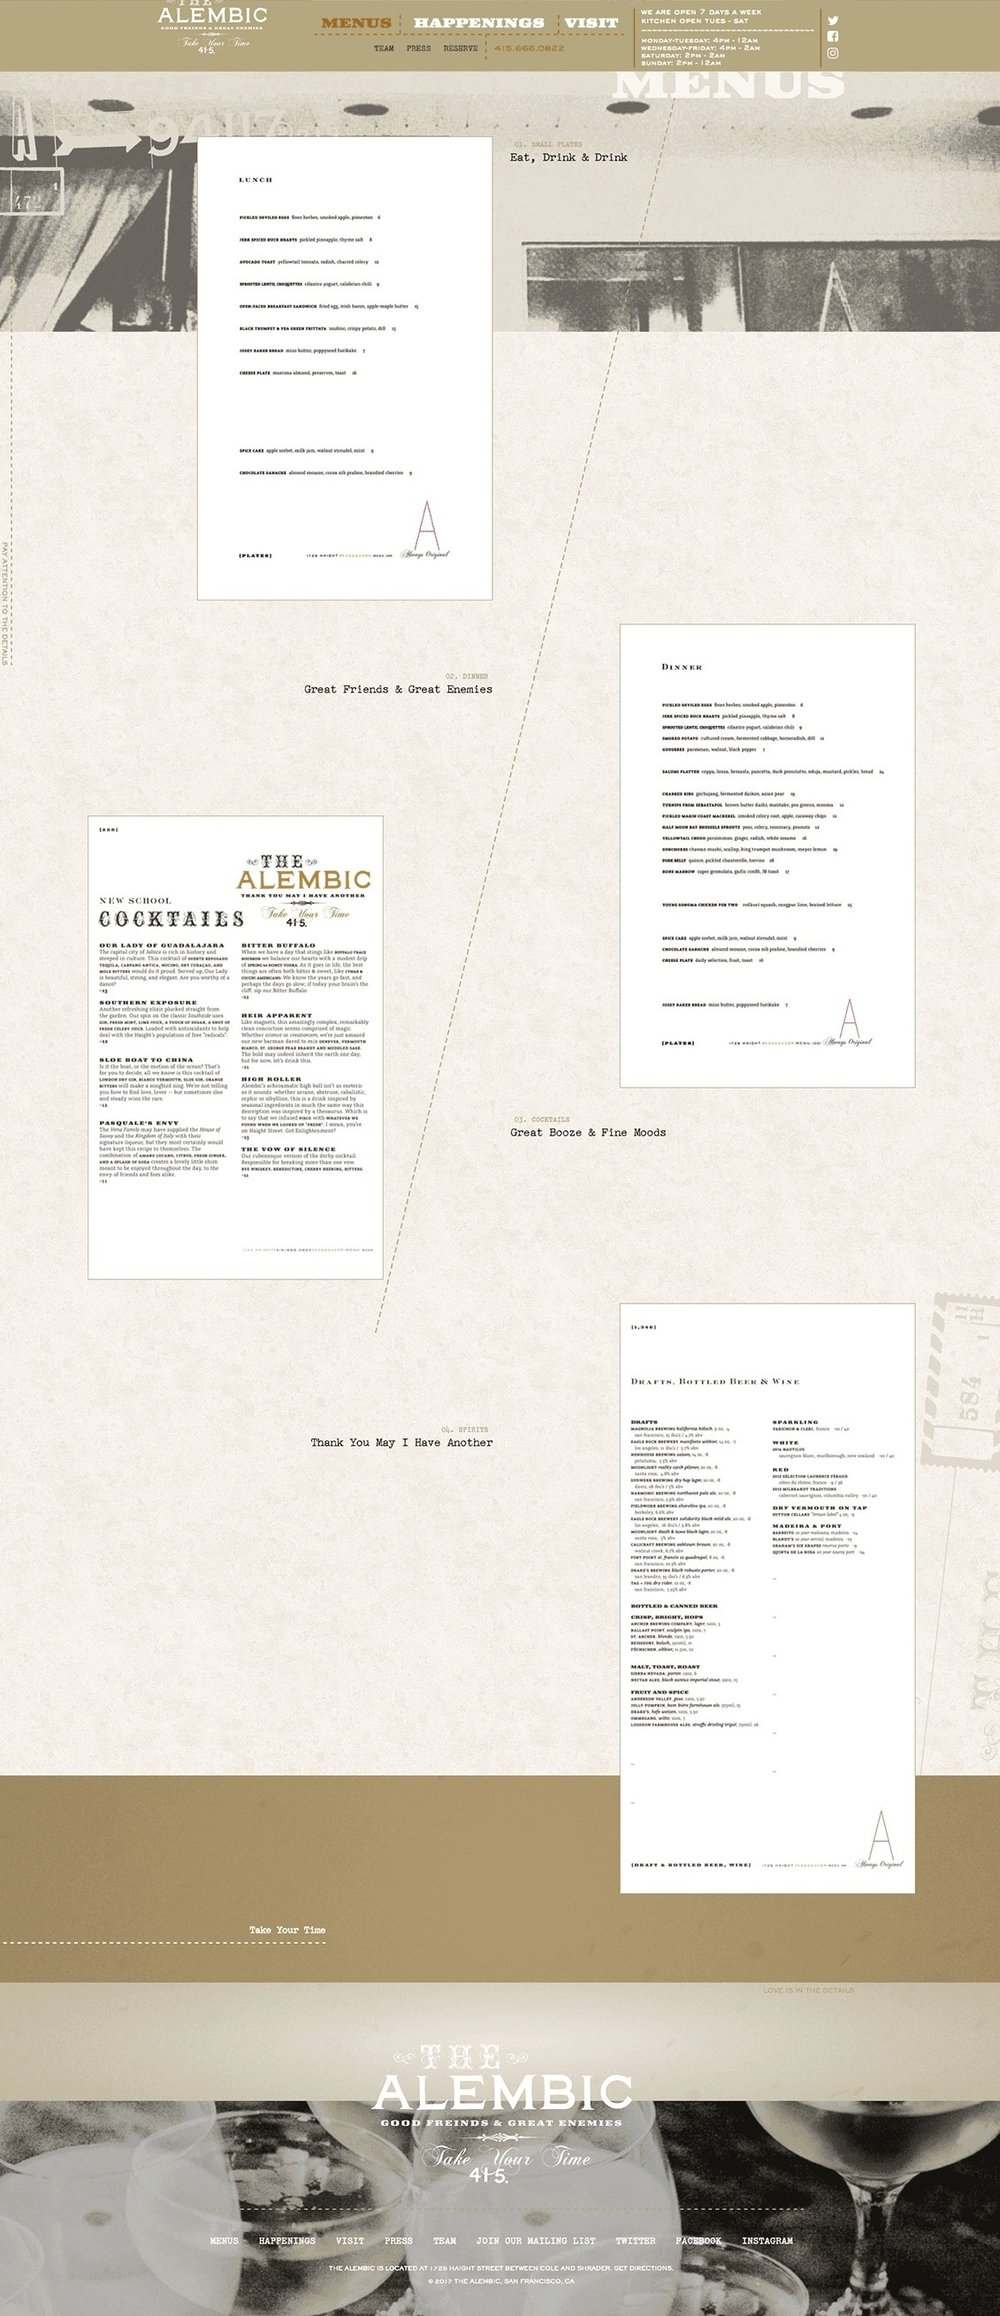 alembic website design.jpg